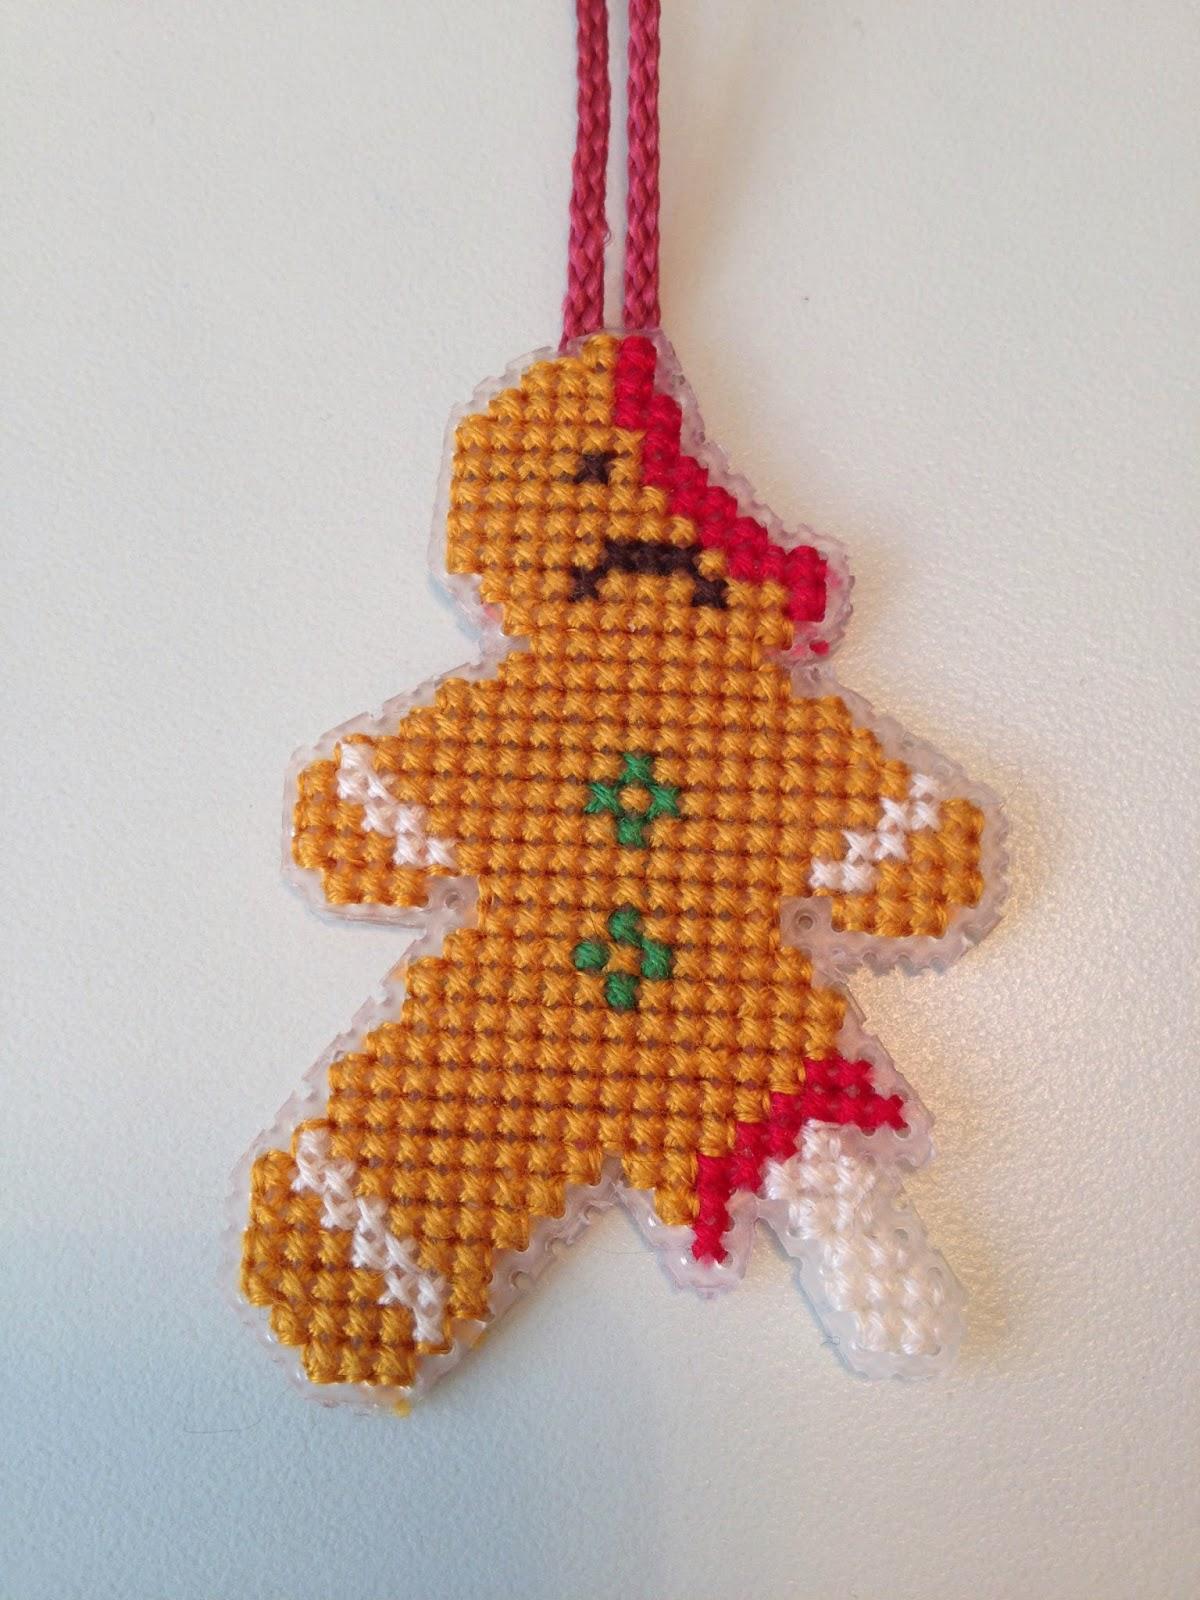 Julepynt med humor. Halvspist maltrakteret kagemand i korssting broderi. På plastik kanvas.